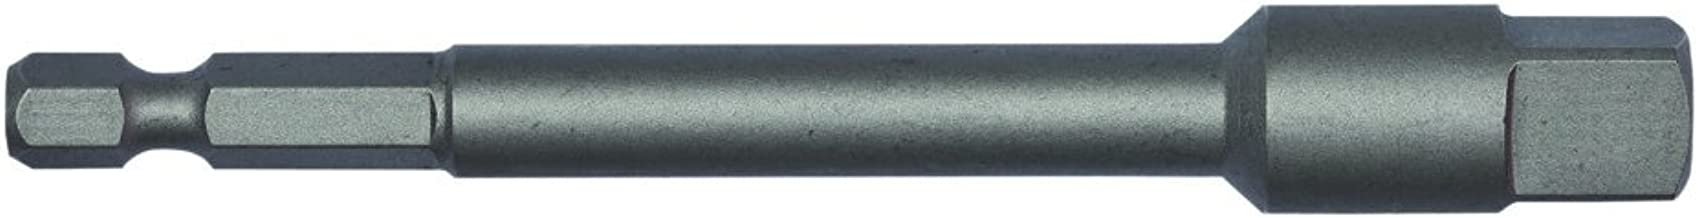 Bahco K66100-1//4-1P 1XBITS ADAPTOR 1//4 IVE 100MM